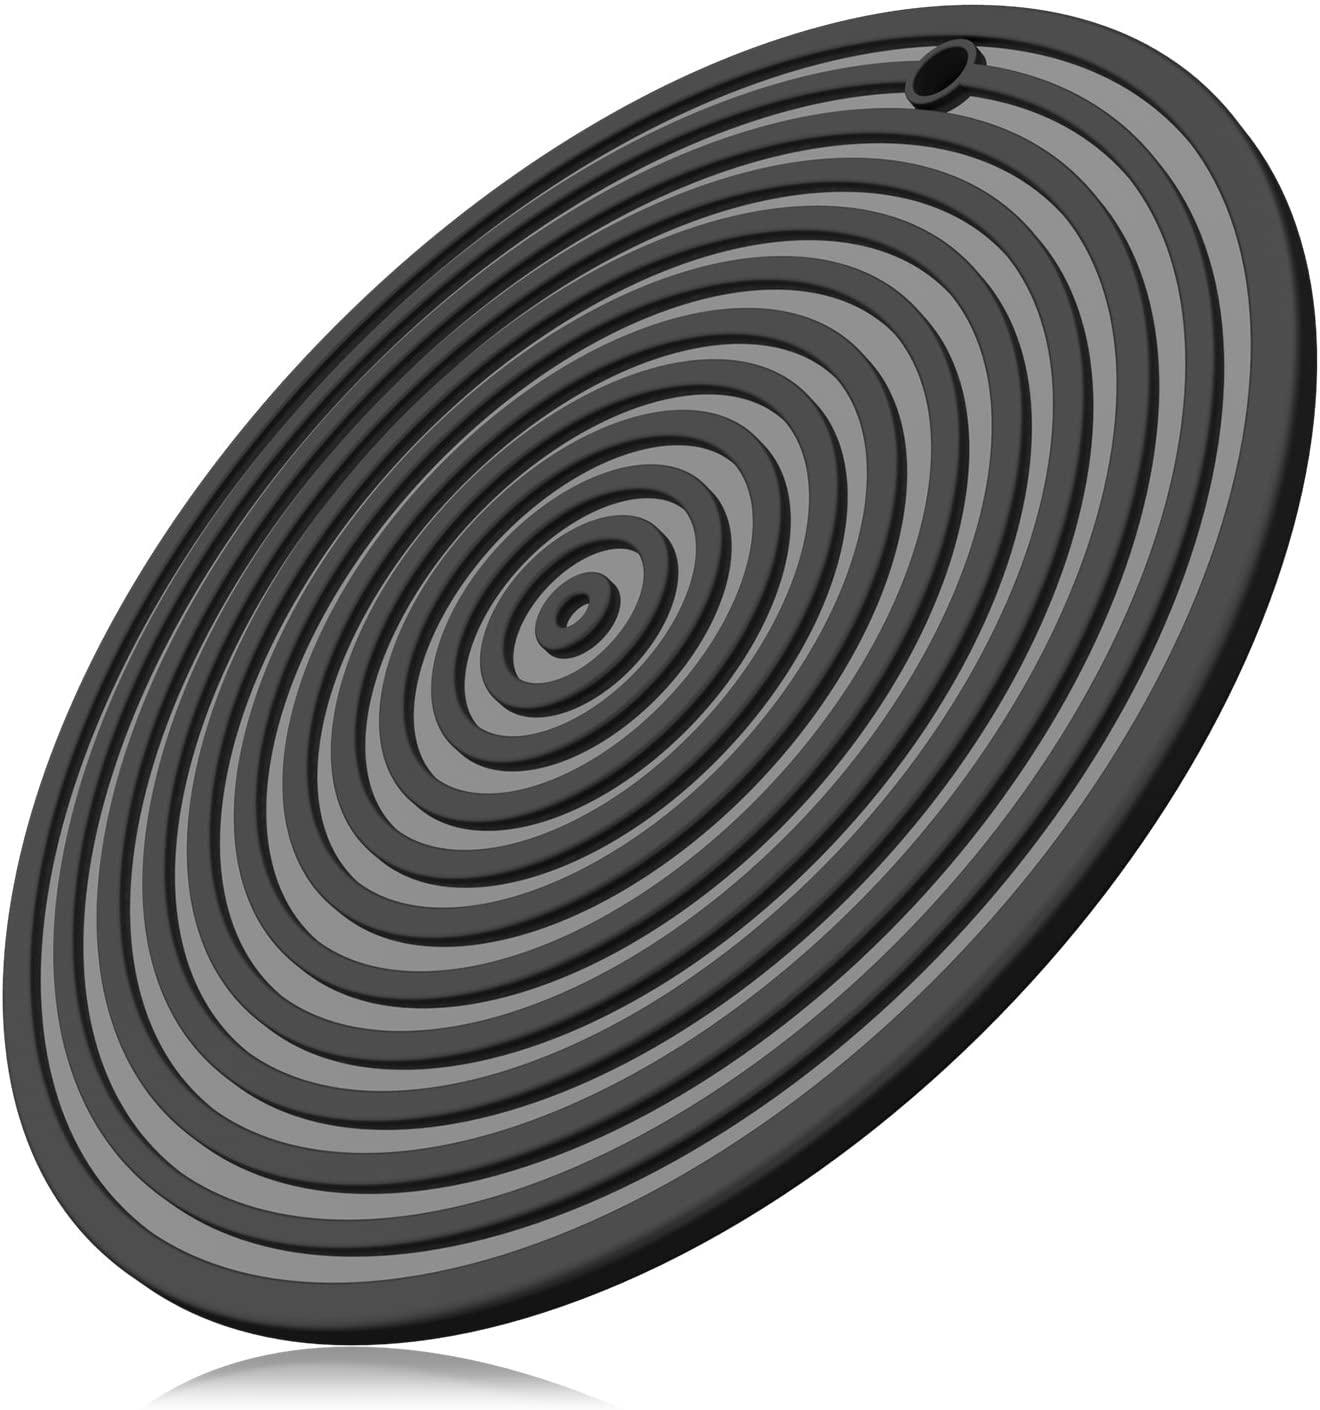 ME.FAN 11'' Large Silicone Ripple Trivet Mat, Potholder, Hot Pad, Spoon Rest, Jar Opener & Coaster, Heat Resistant up to 480F, Flexible, Durable & Non Slip (Black)